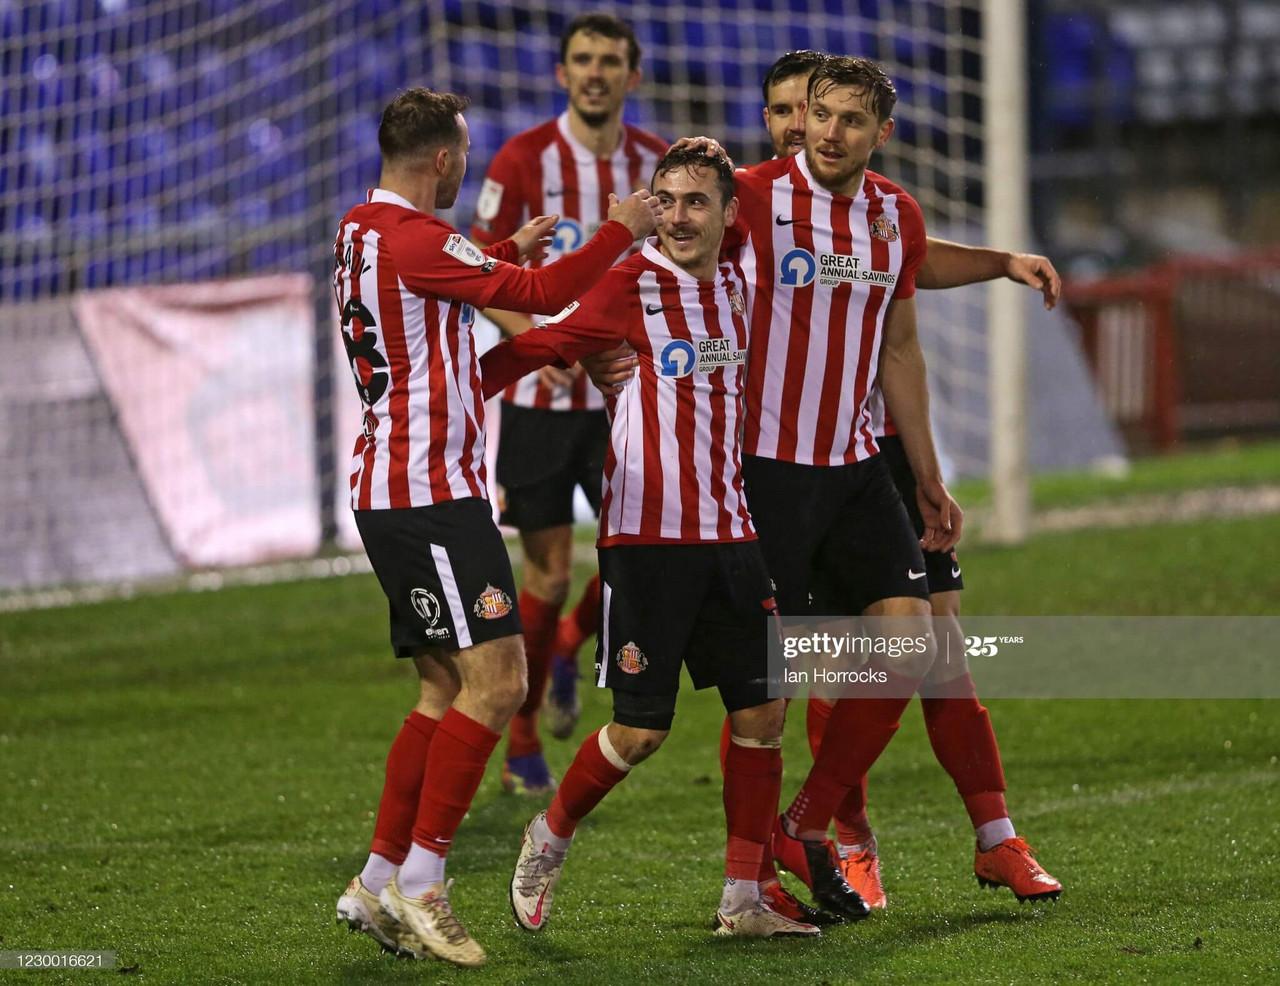 Oldham Athletic 1-2 Sunderland: Johnson gets first win as Sunderland manager